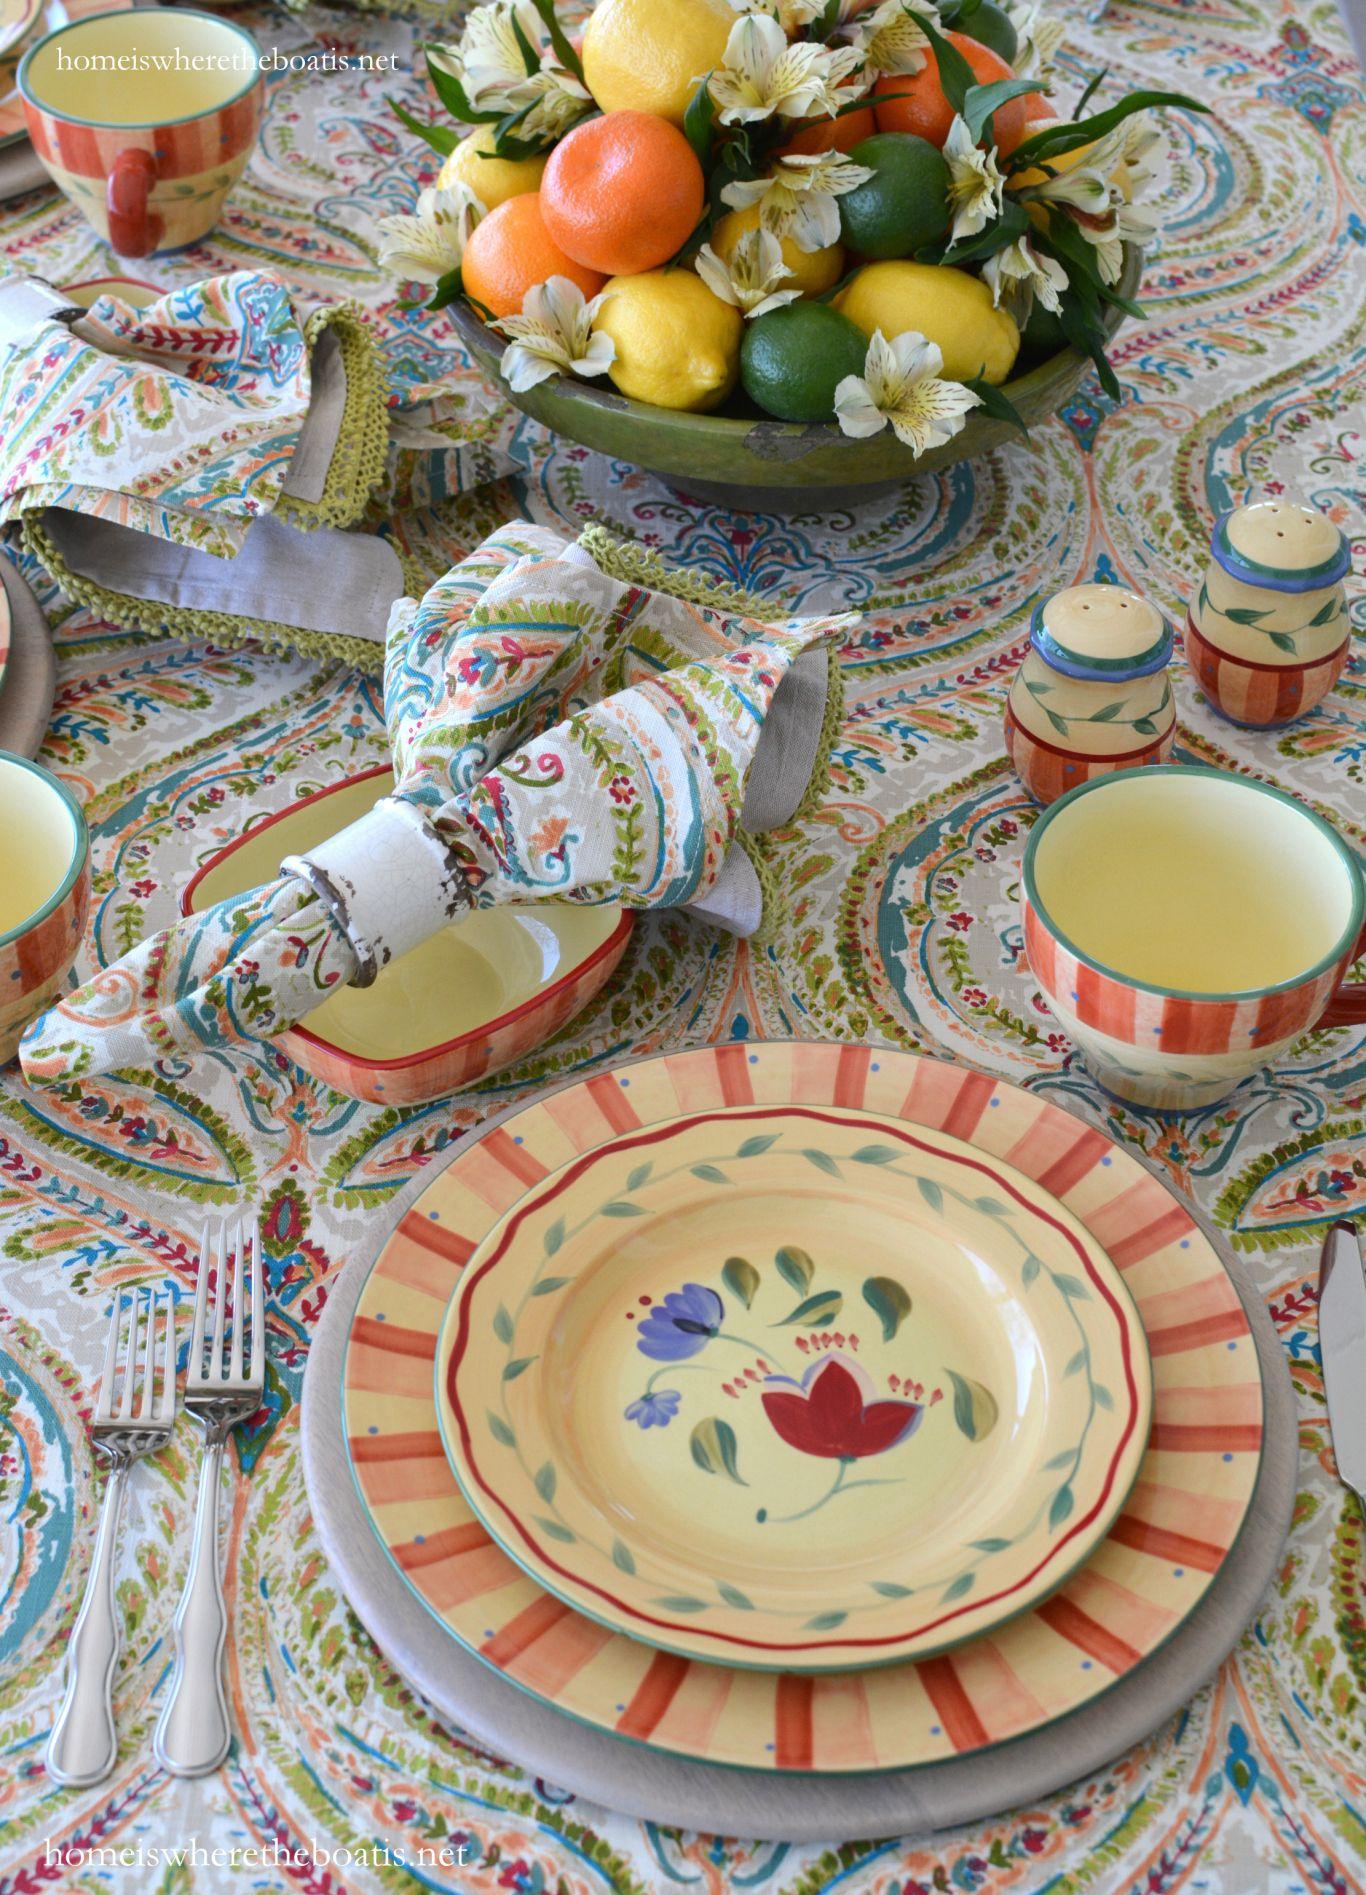 Citrus centerpiece and Pfaltzgraff Napoli Dinnerware | homeiswheretheboatis.net #tablescape & Citrus centerpiece and Pfaltzgraff Napoli Dinnerware ...